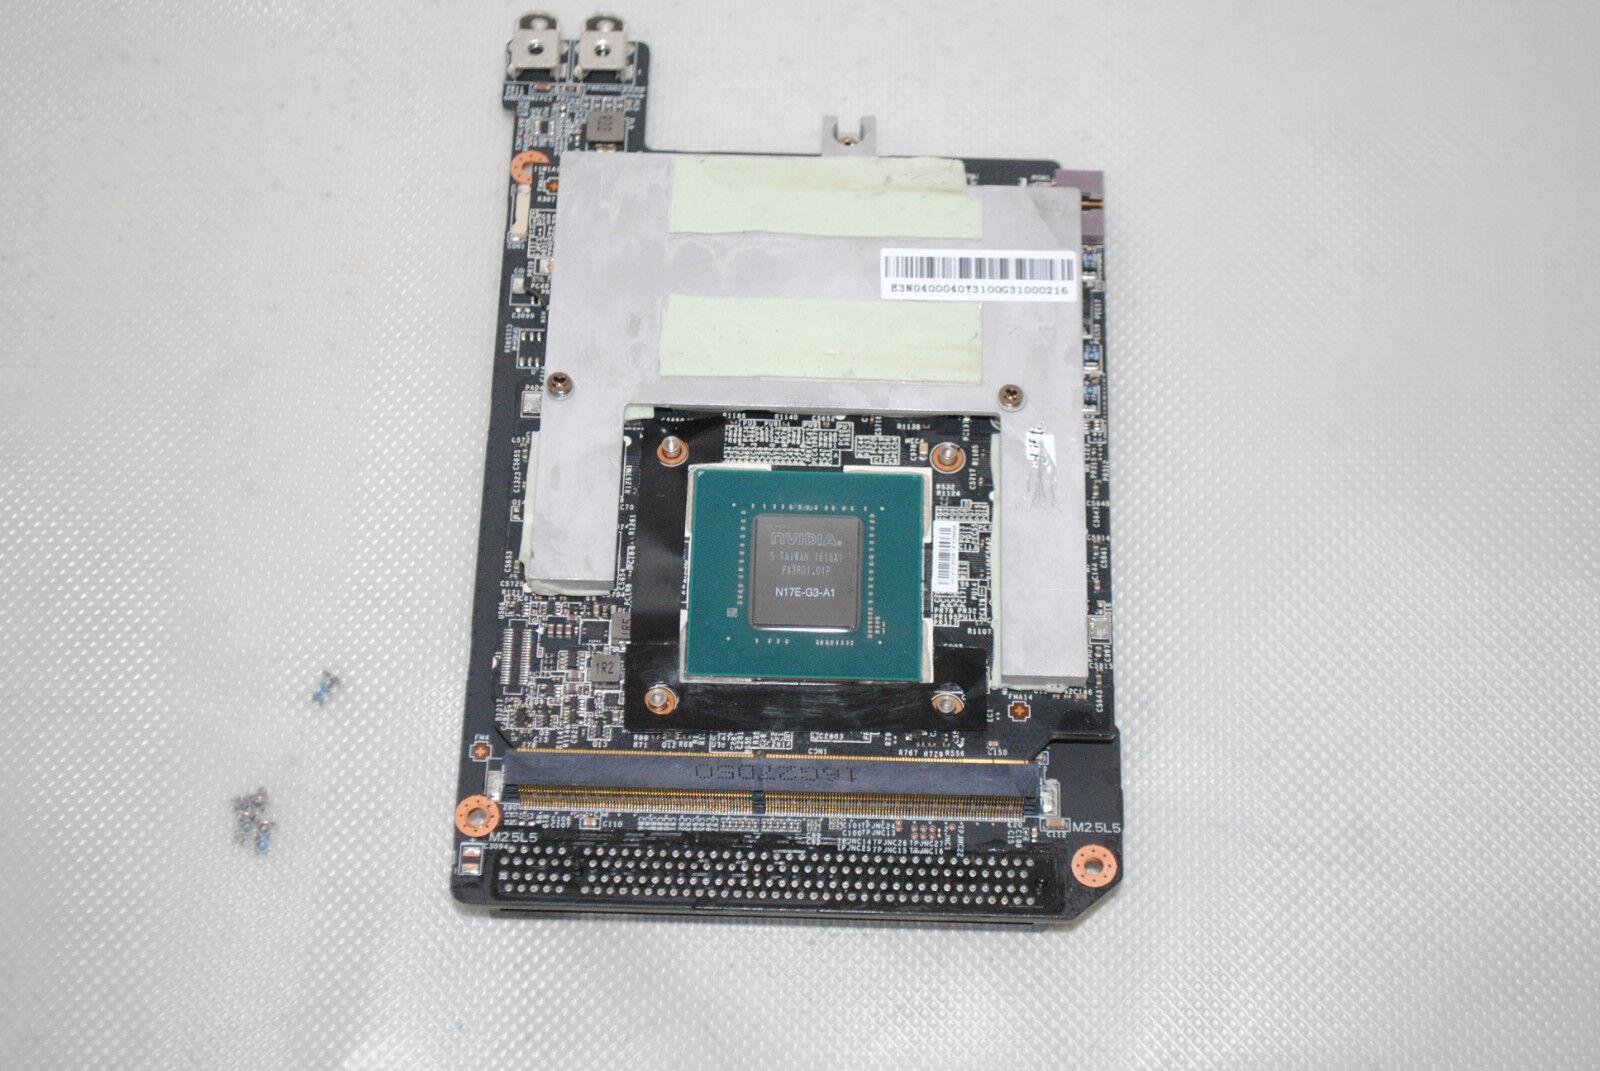 MSI VR Vortex G65VR-082 NVIDIA GTX 1080 MXM 3 0b Graphic Card 8GB DDR5X  +mount